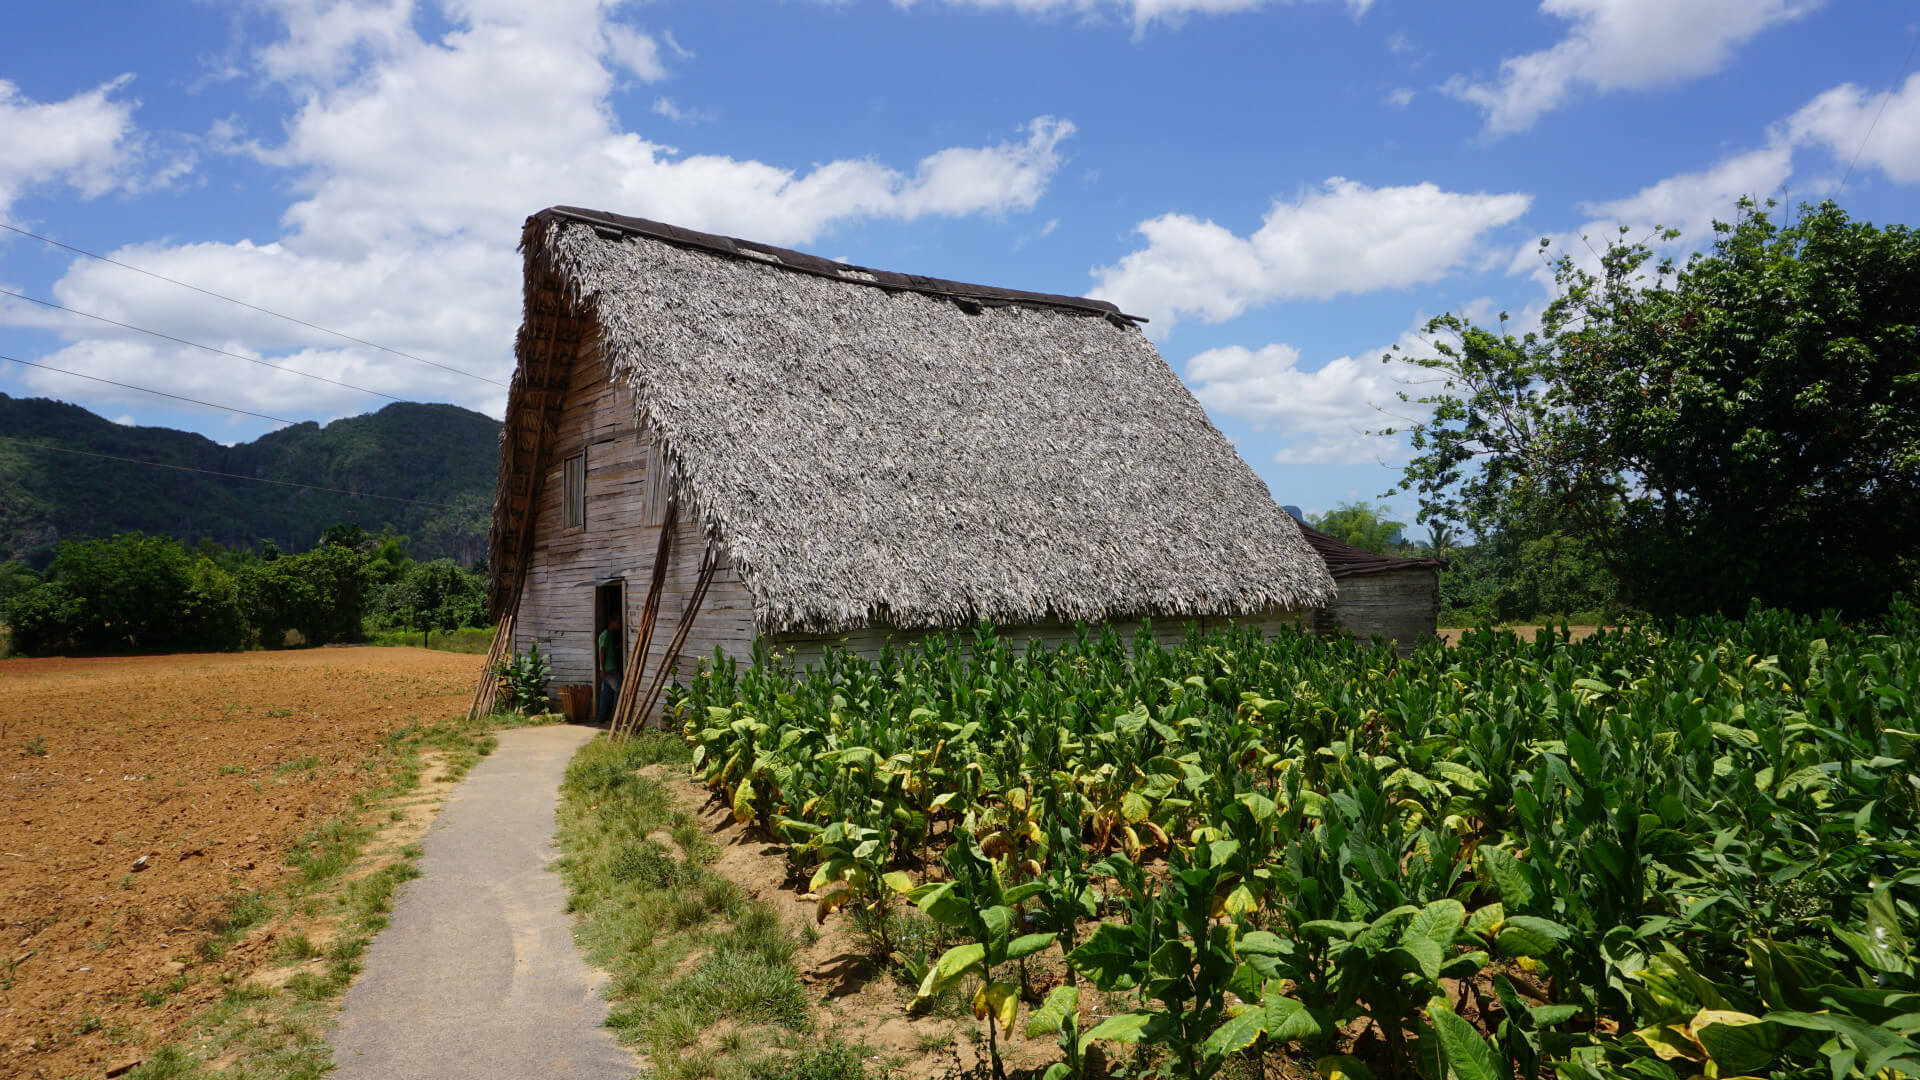 Vinales - The intact jewel of Cuba